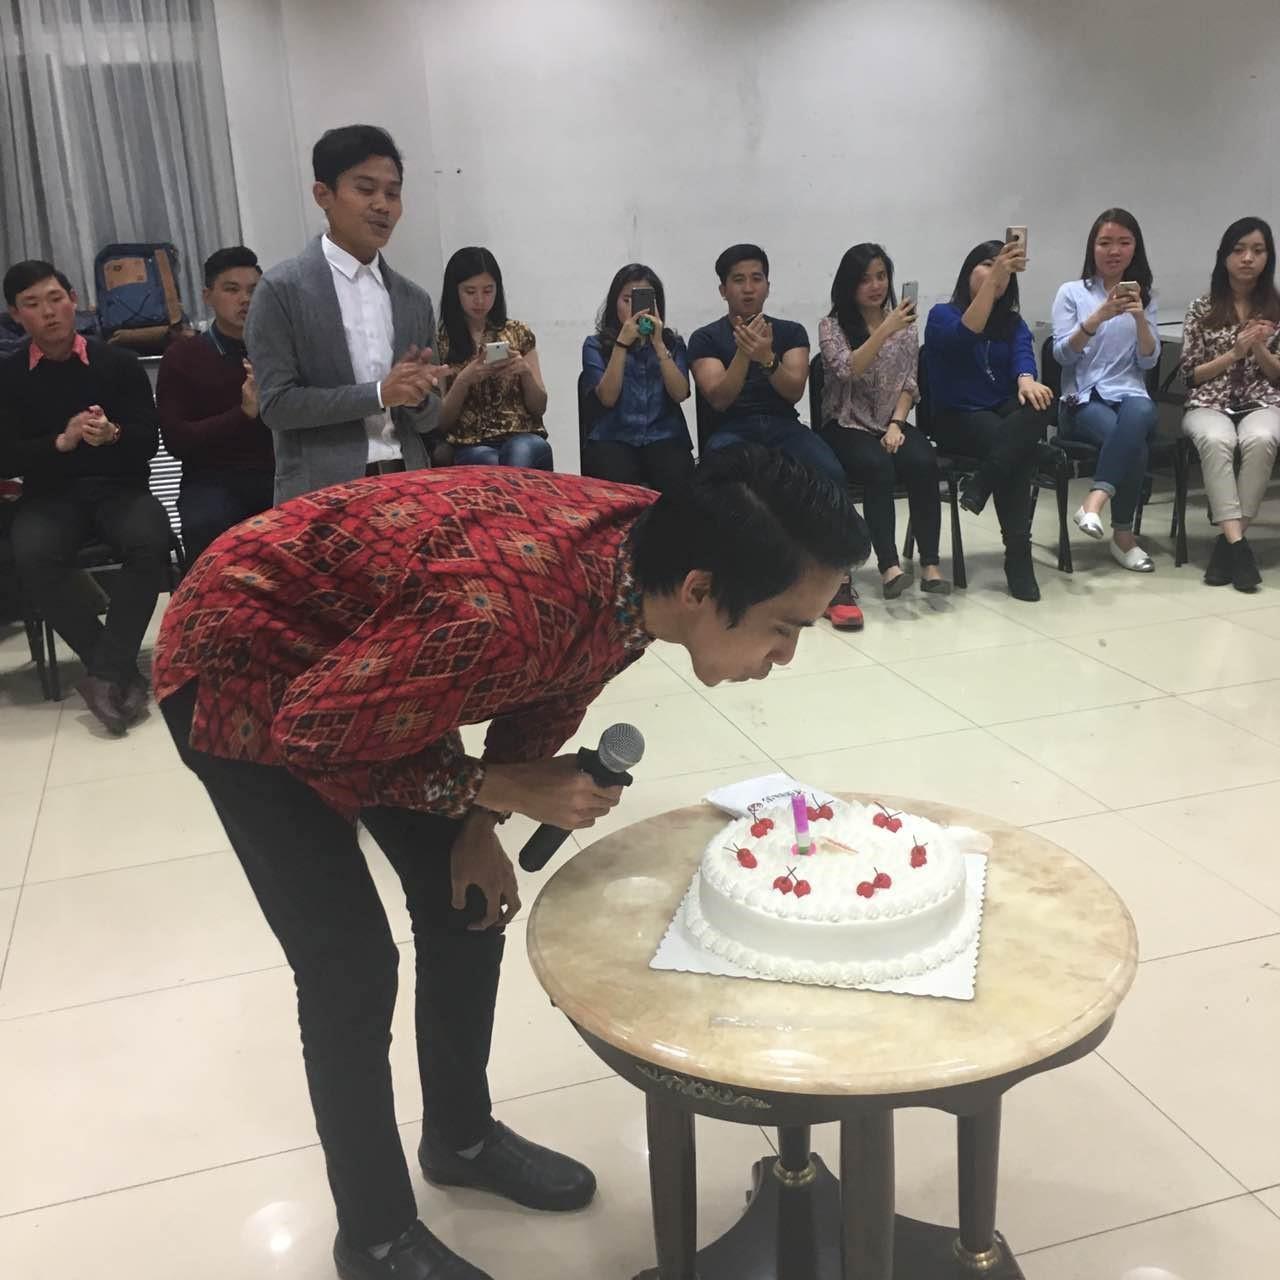 lilin-kue-ulang-tahun-ppi-tiongkok